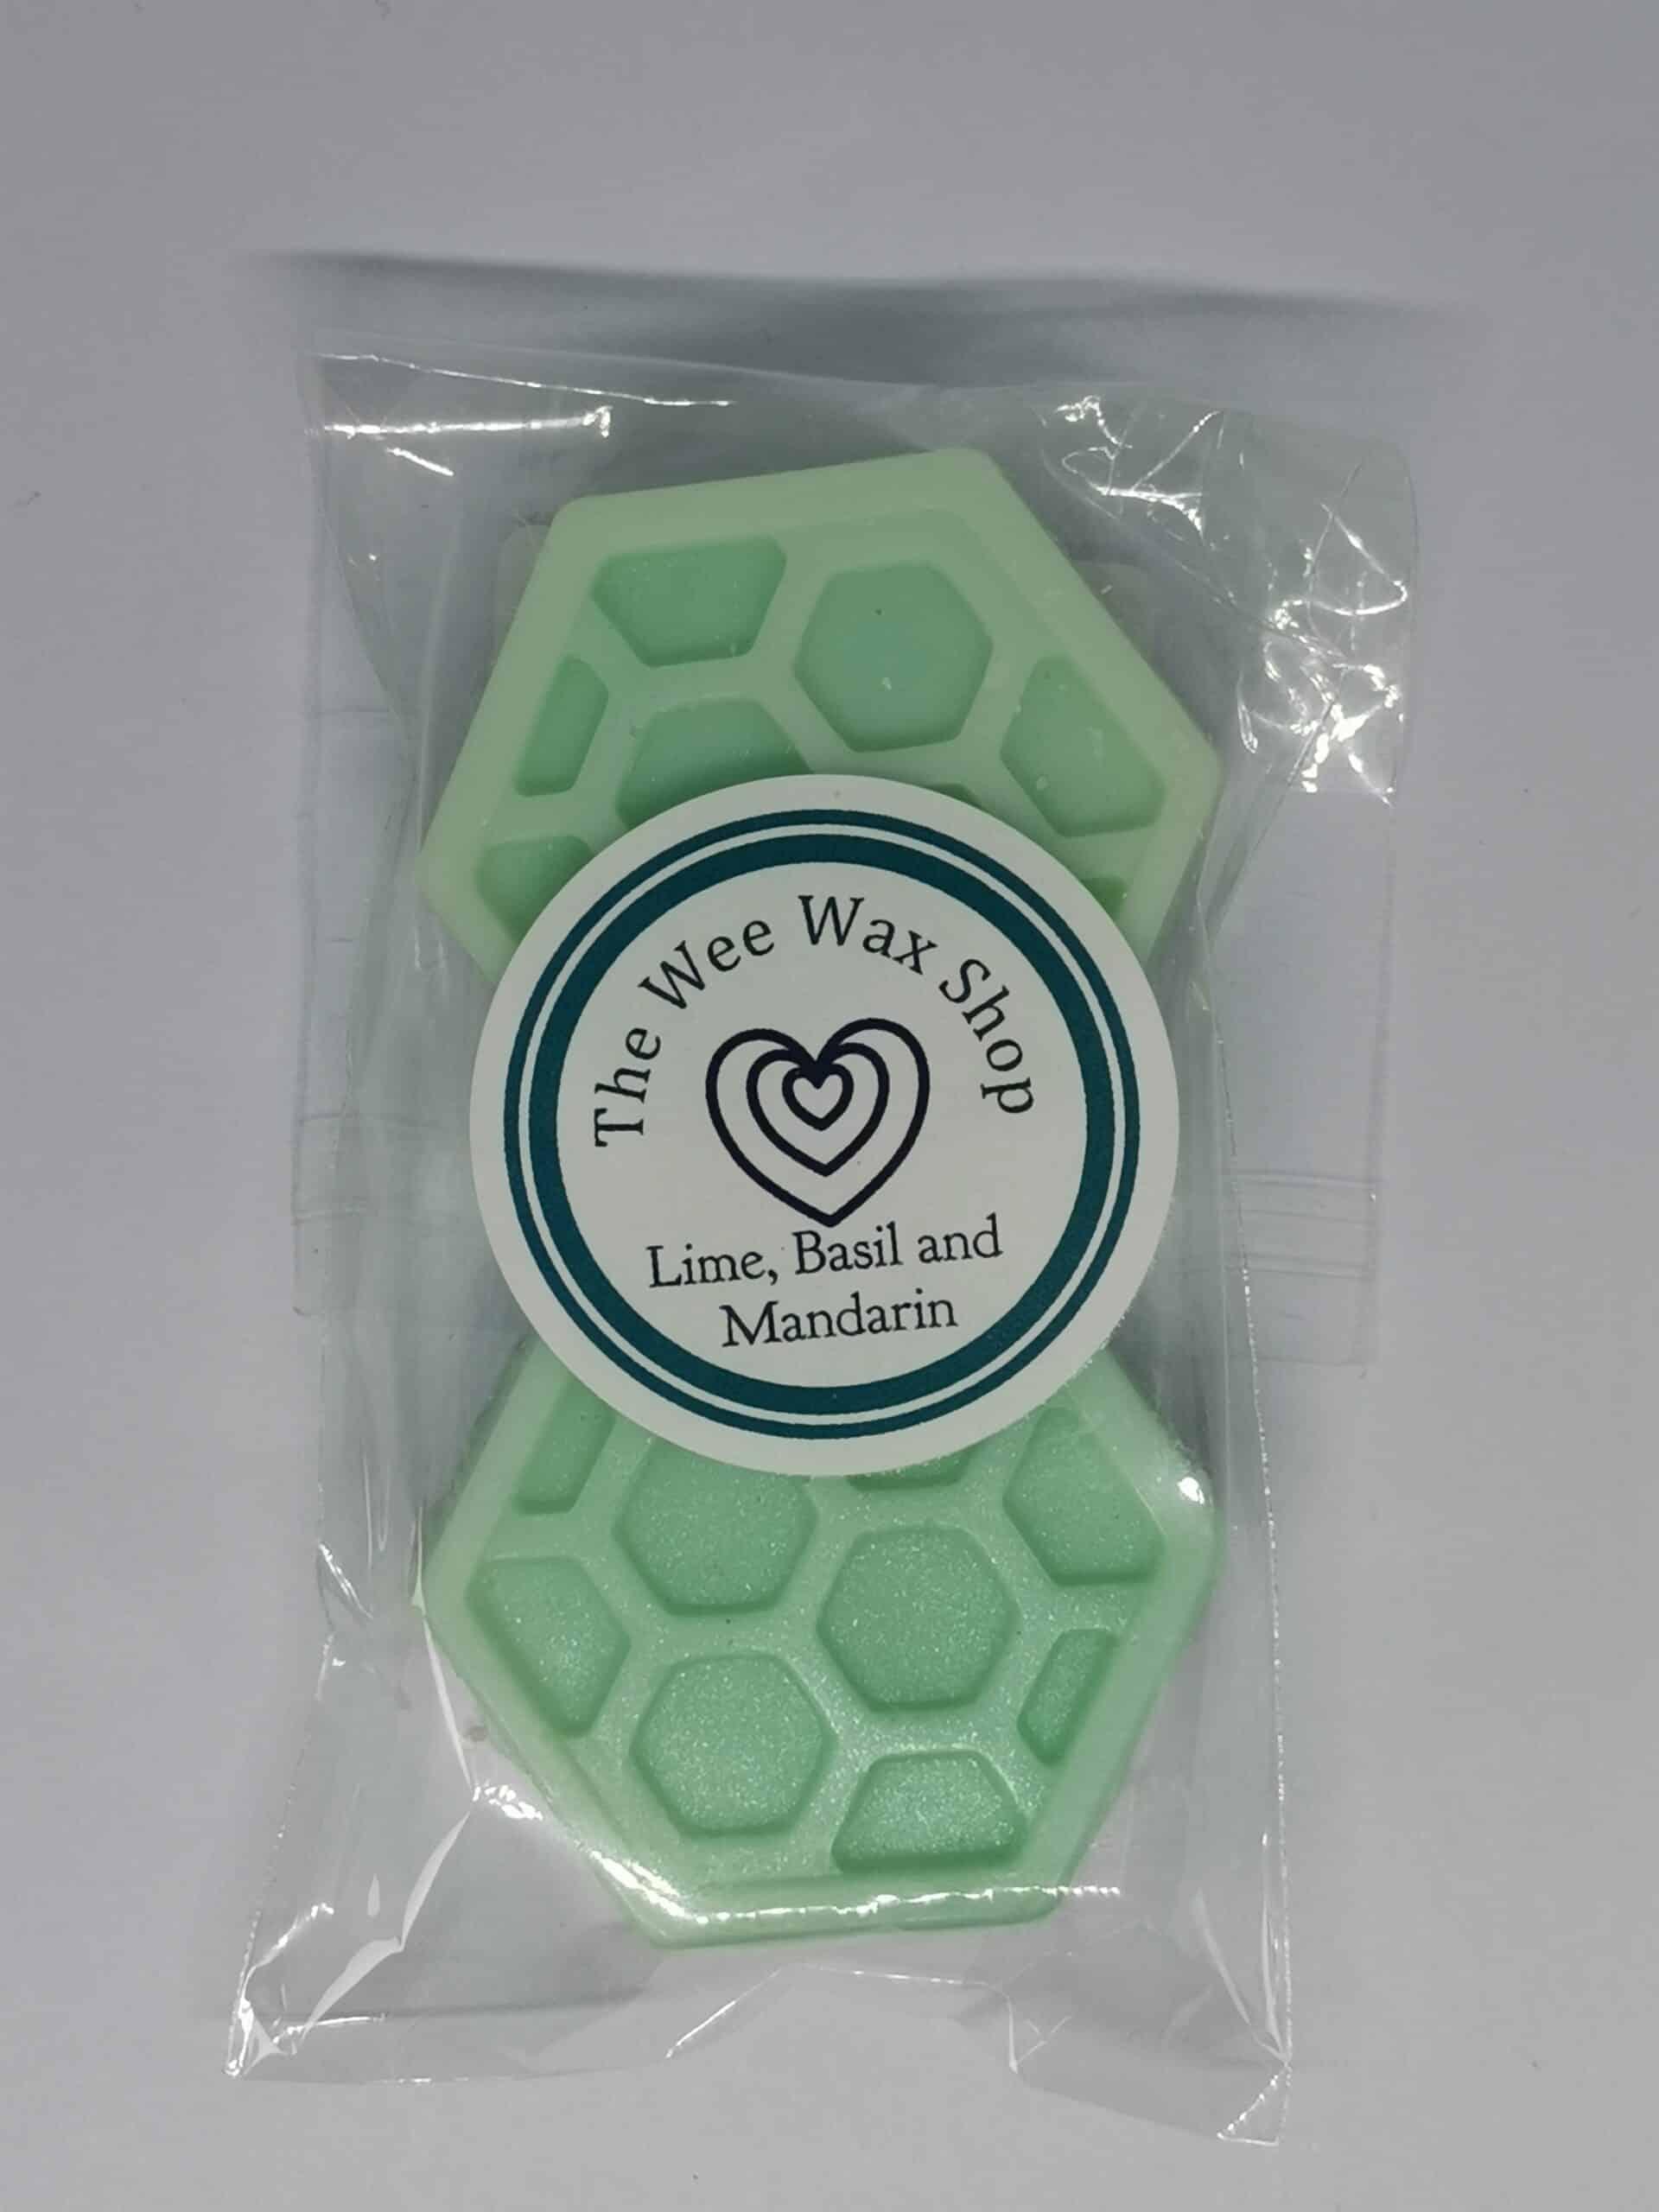 Honeycomb Lime Basil and Mandarin Wax Melt scaled